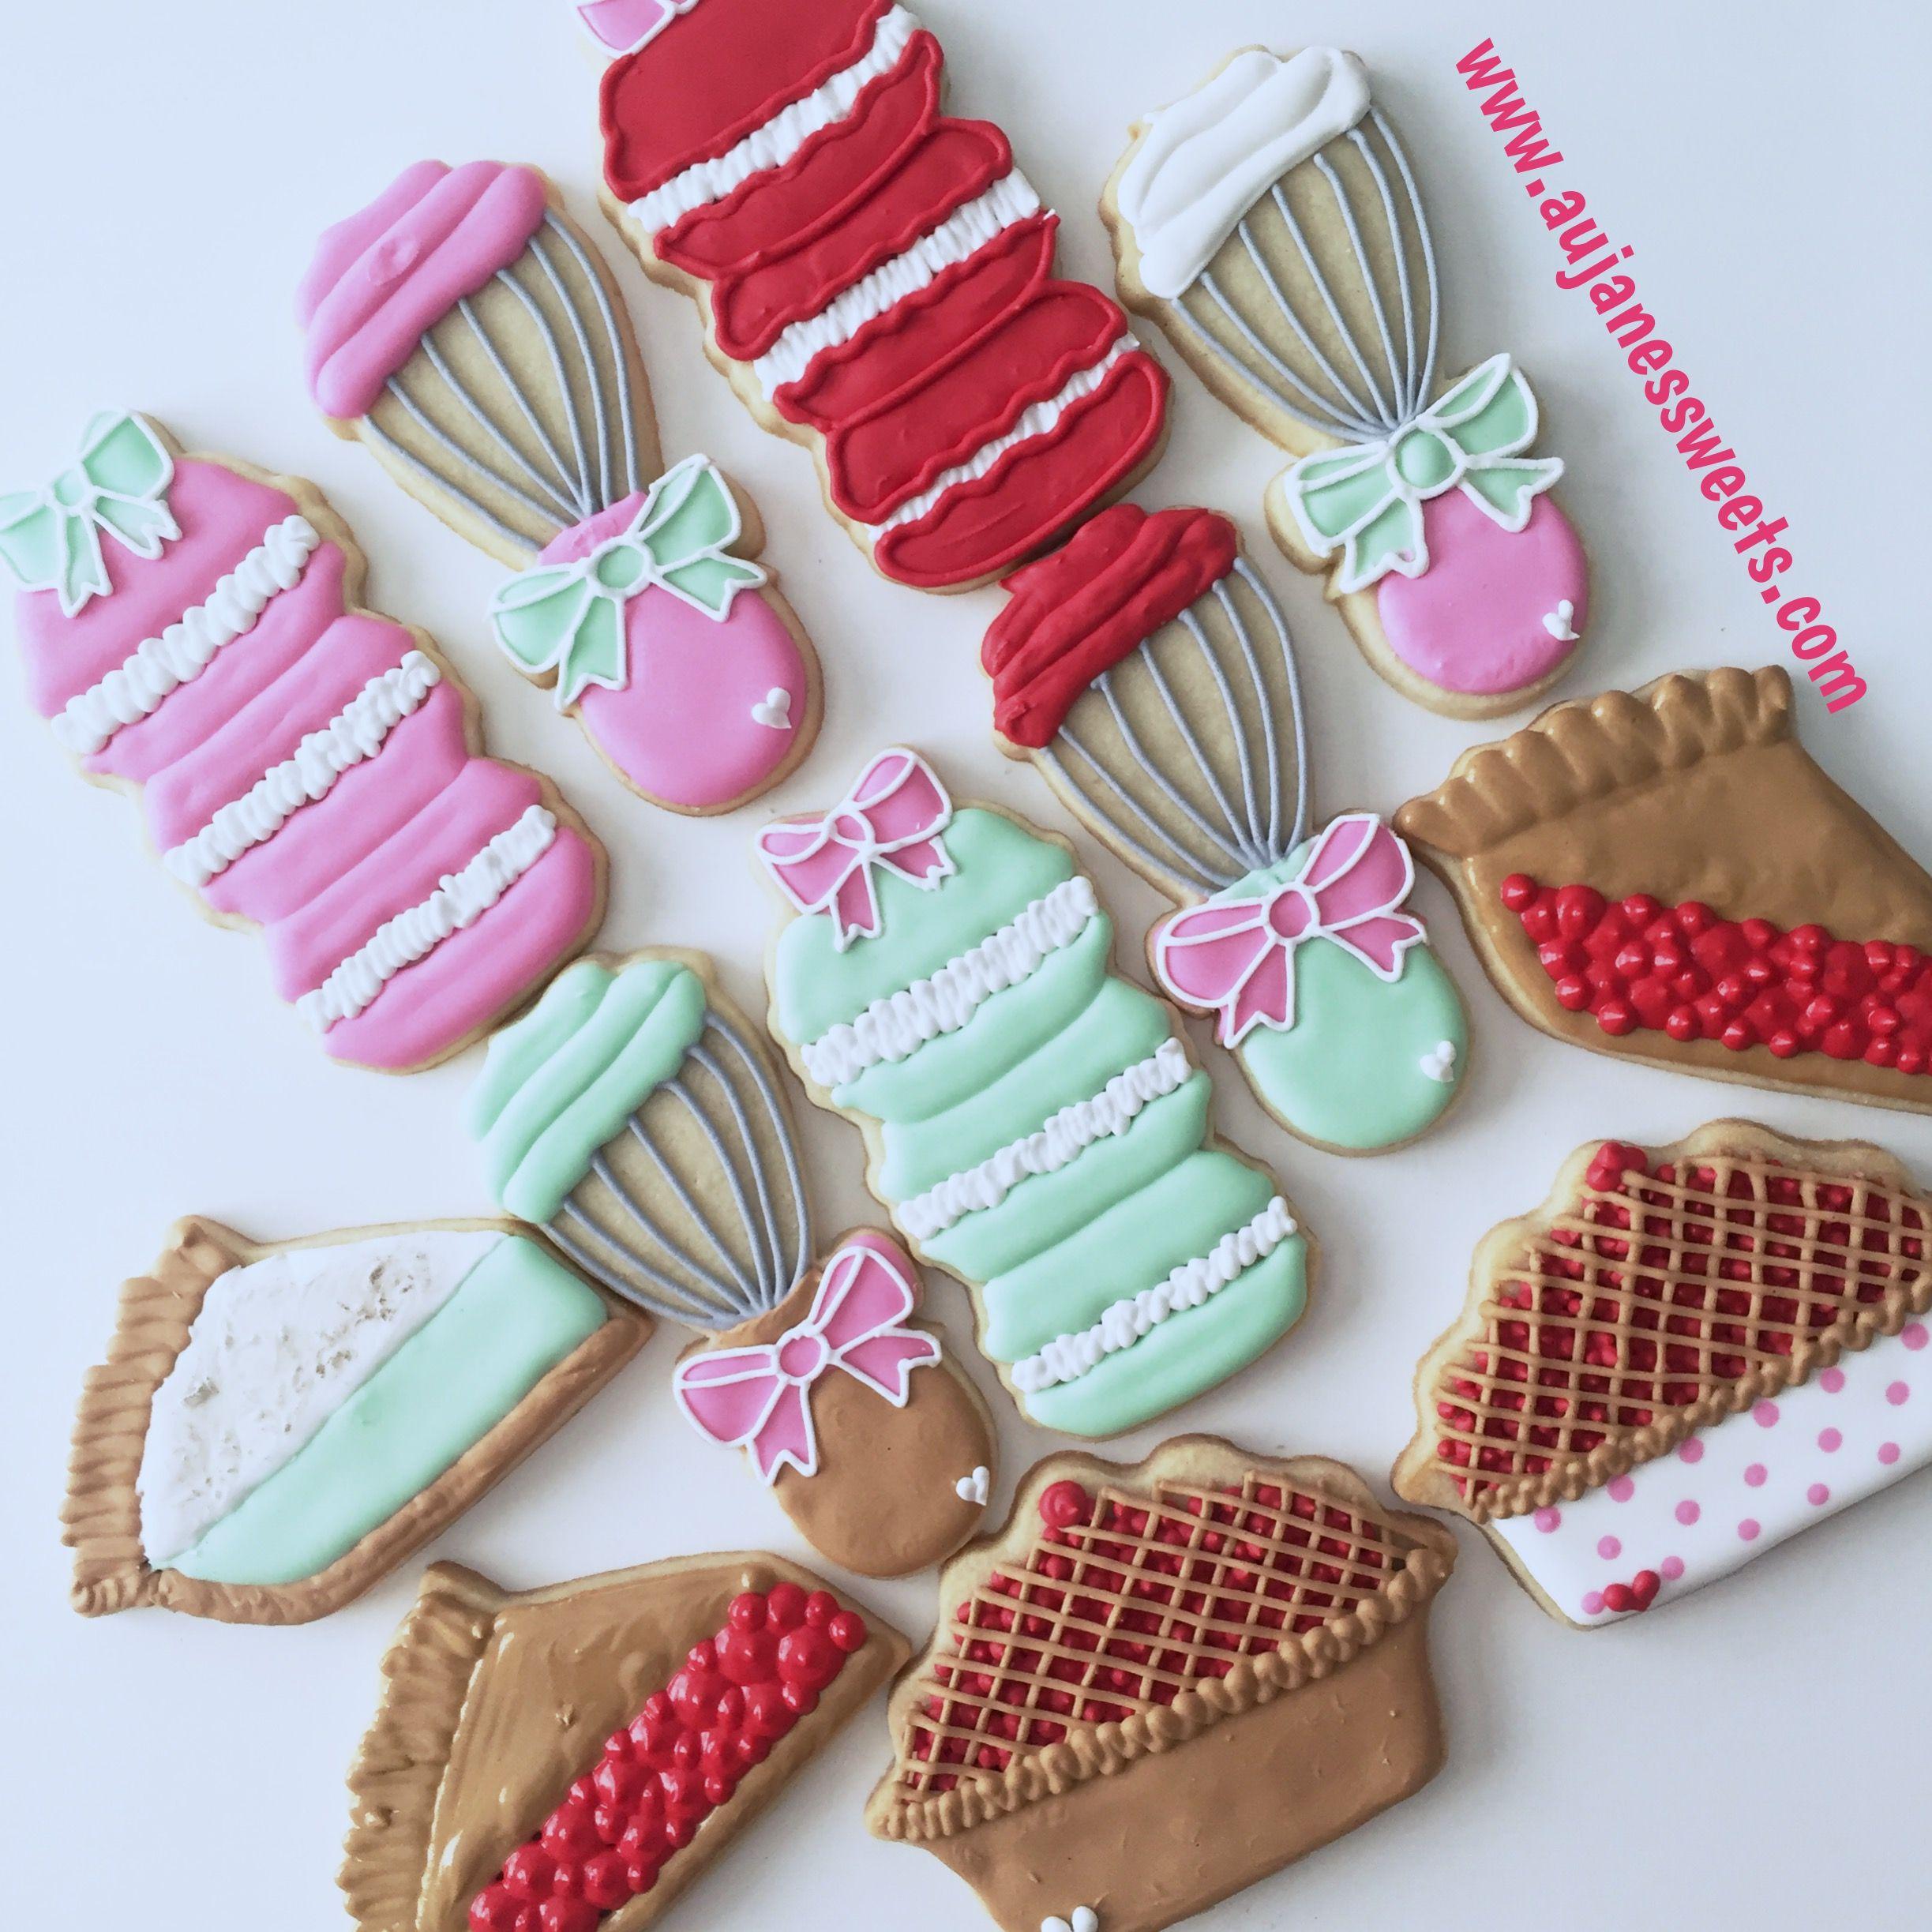 I am in love with these new designs!  #sugarcookies #piecookie #macaron #macaroncookie #sliceofpie #aujanessweets #leaguecitytx #whiskcookie #foodie #cookiesofinstagram #decoratedcookies